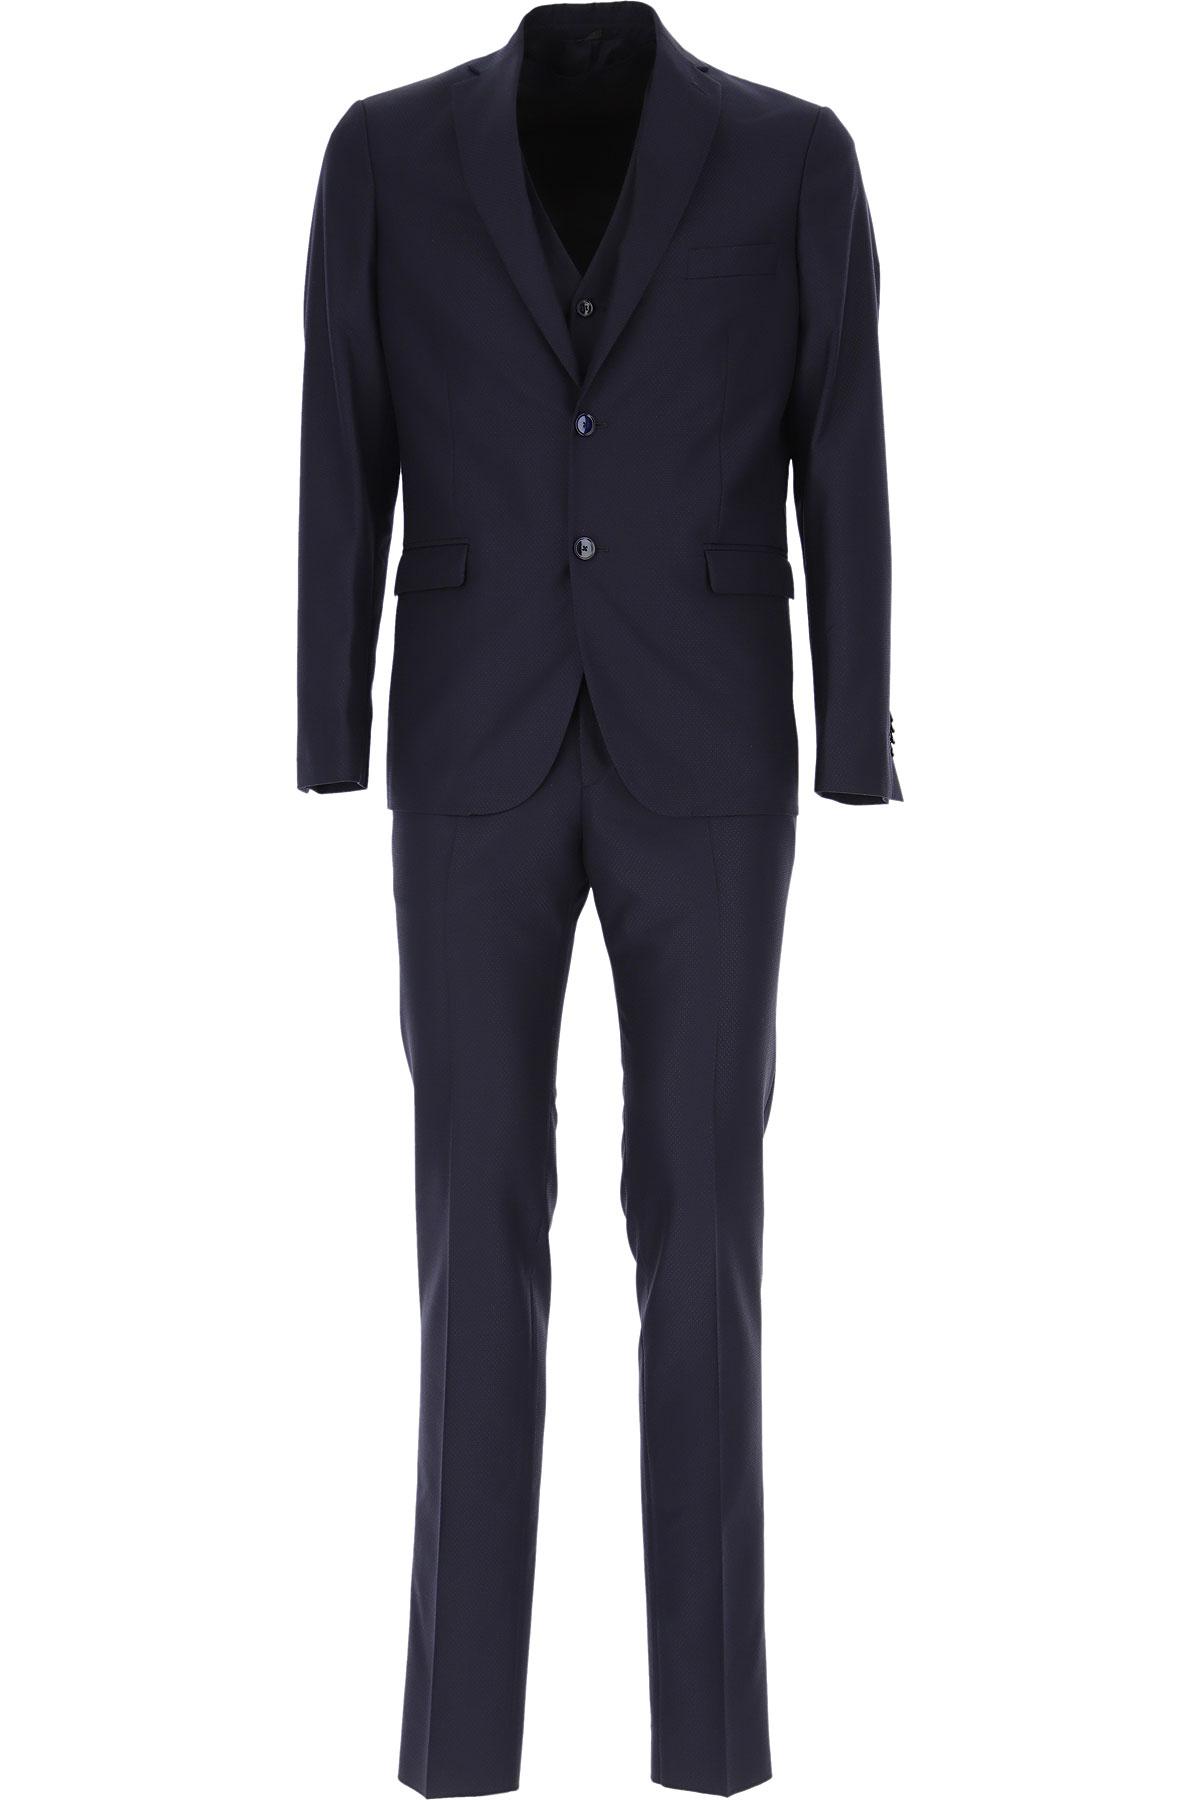 Simbols Men's Suit On Sale, Navy Blue, polyester, 2019, L M S XL XXL XXXL